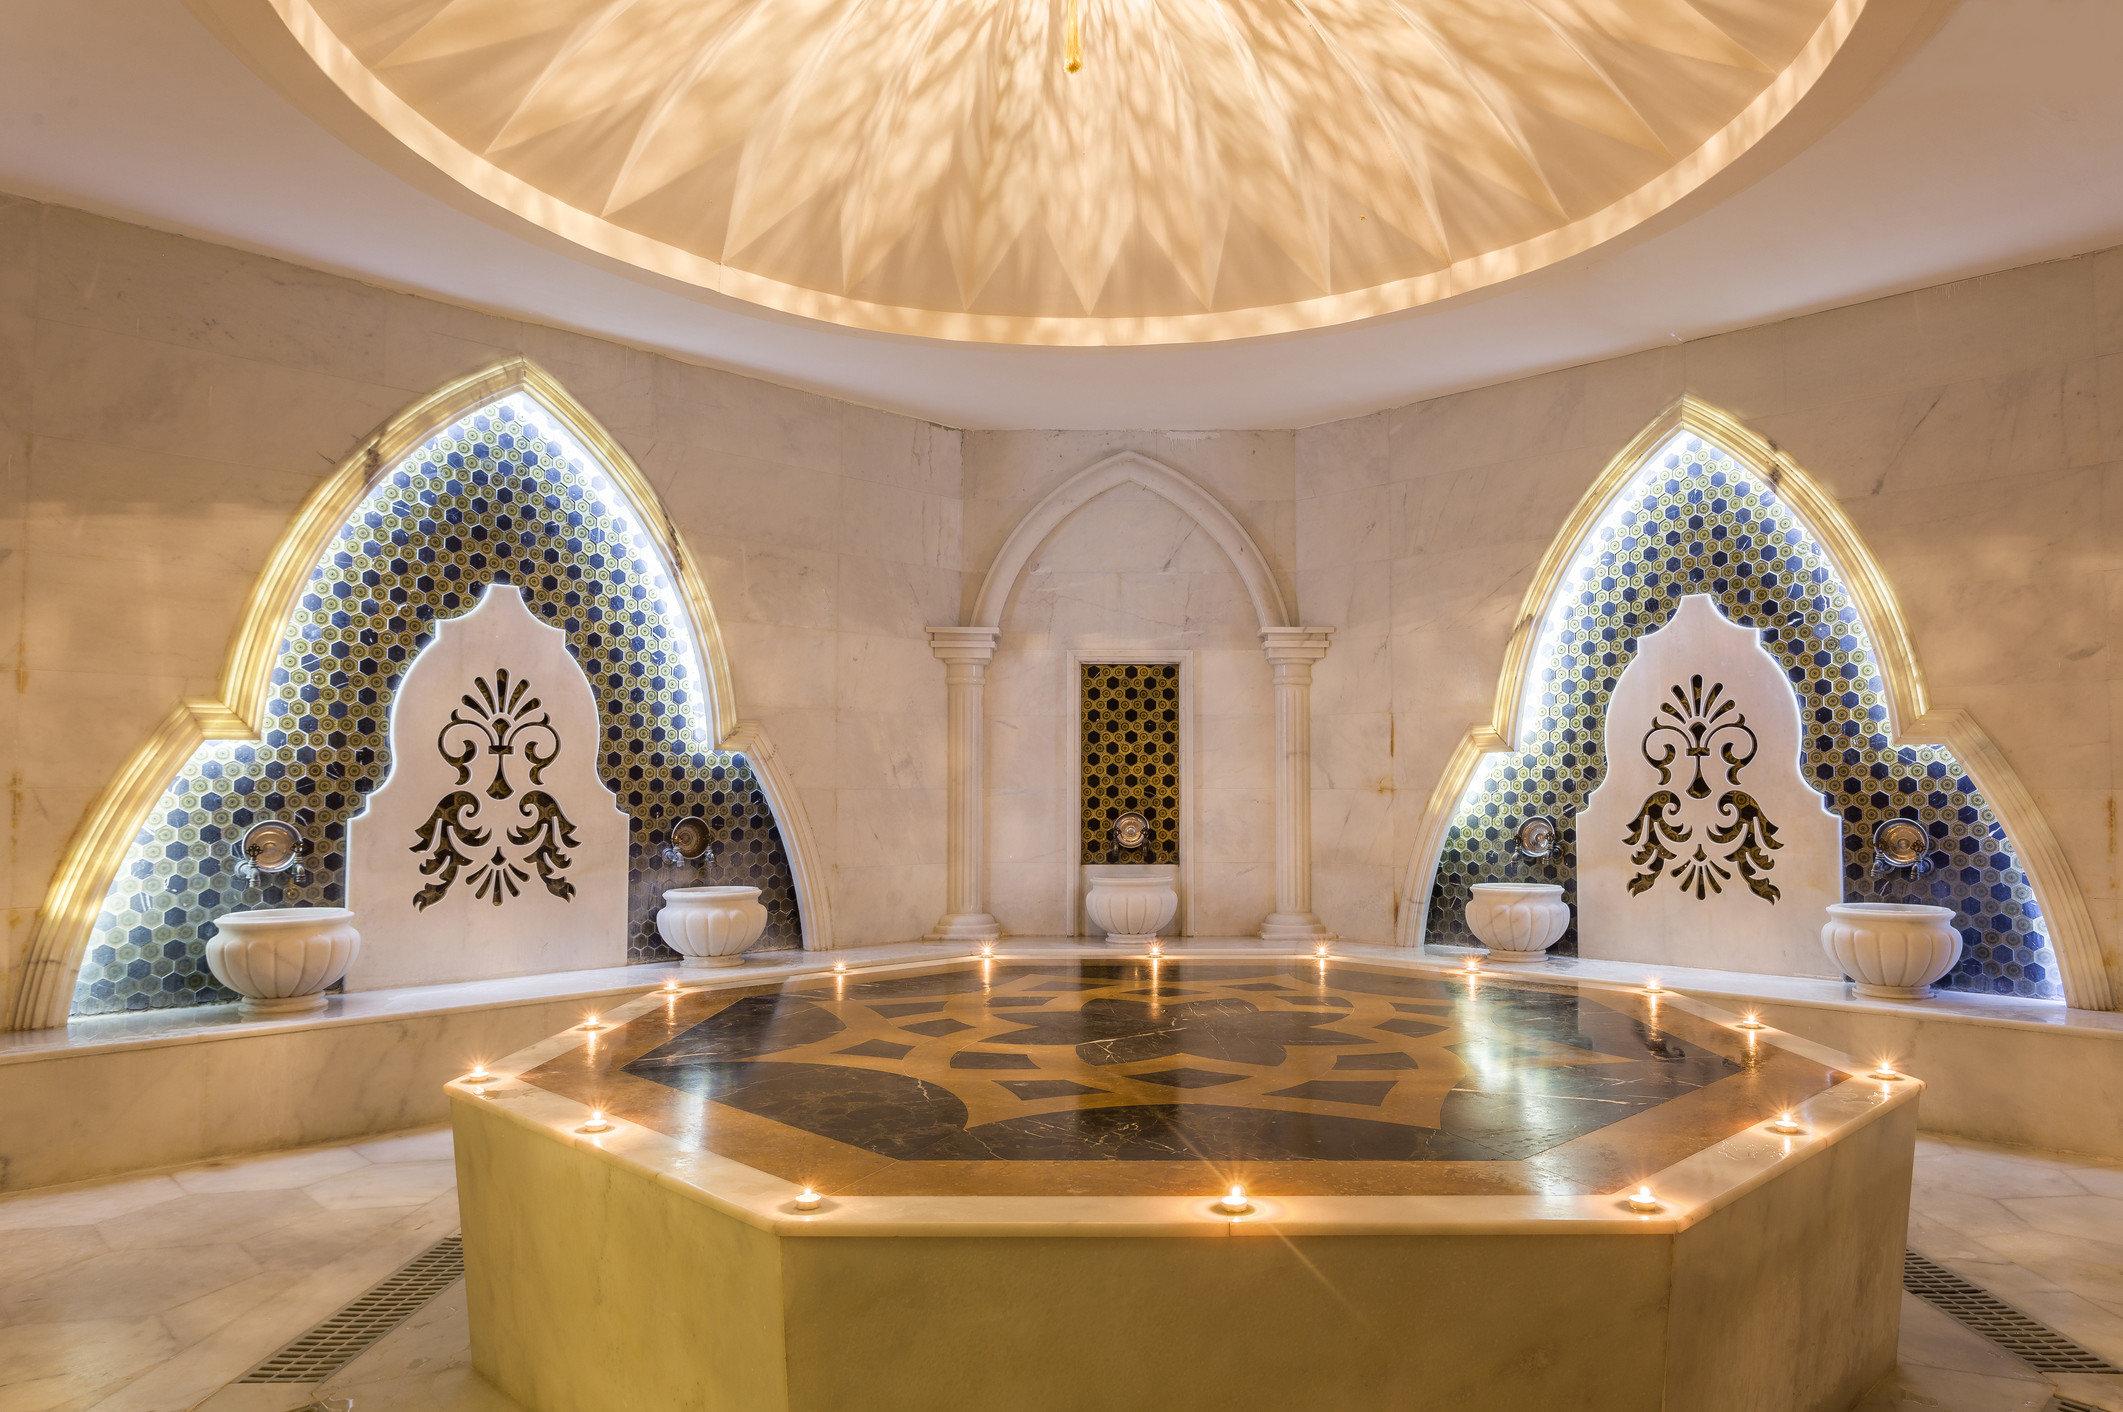 Health + Wellness Trip Ideas indoor interior design estate furniture ceiling Lobby table amenity